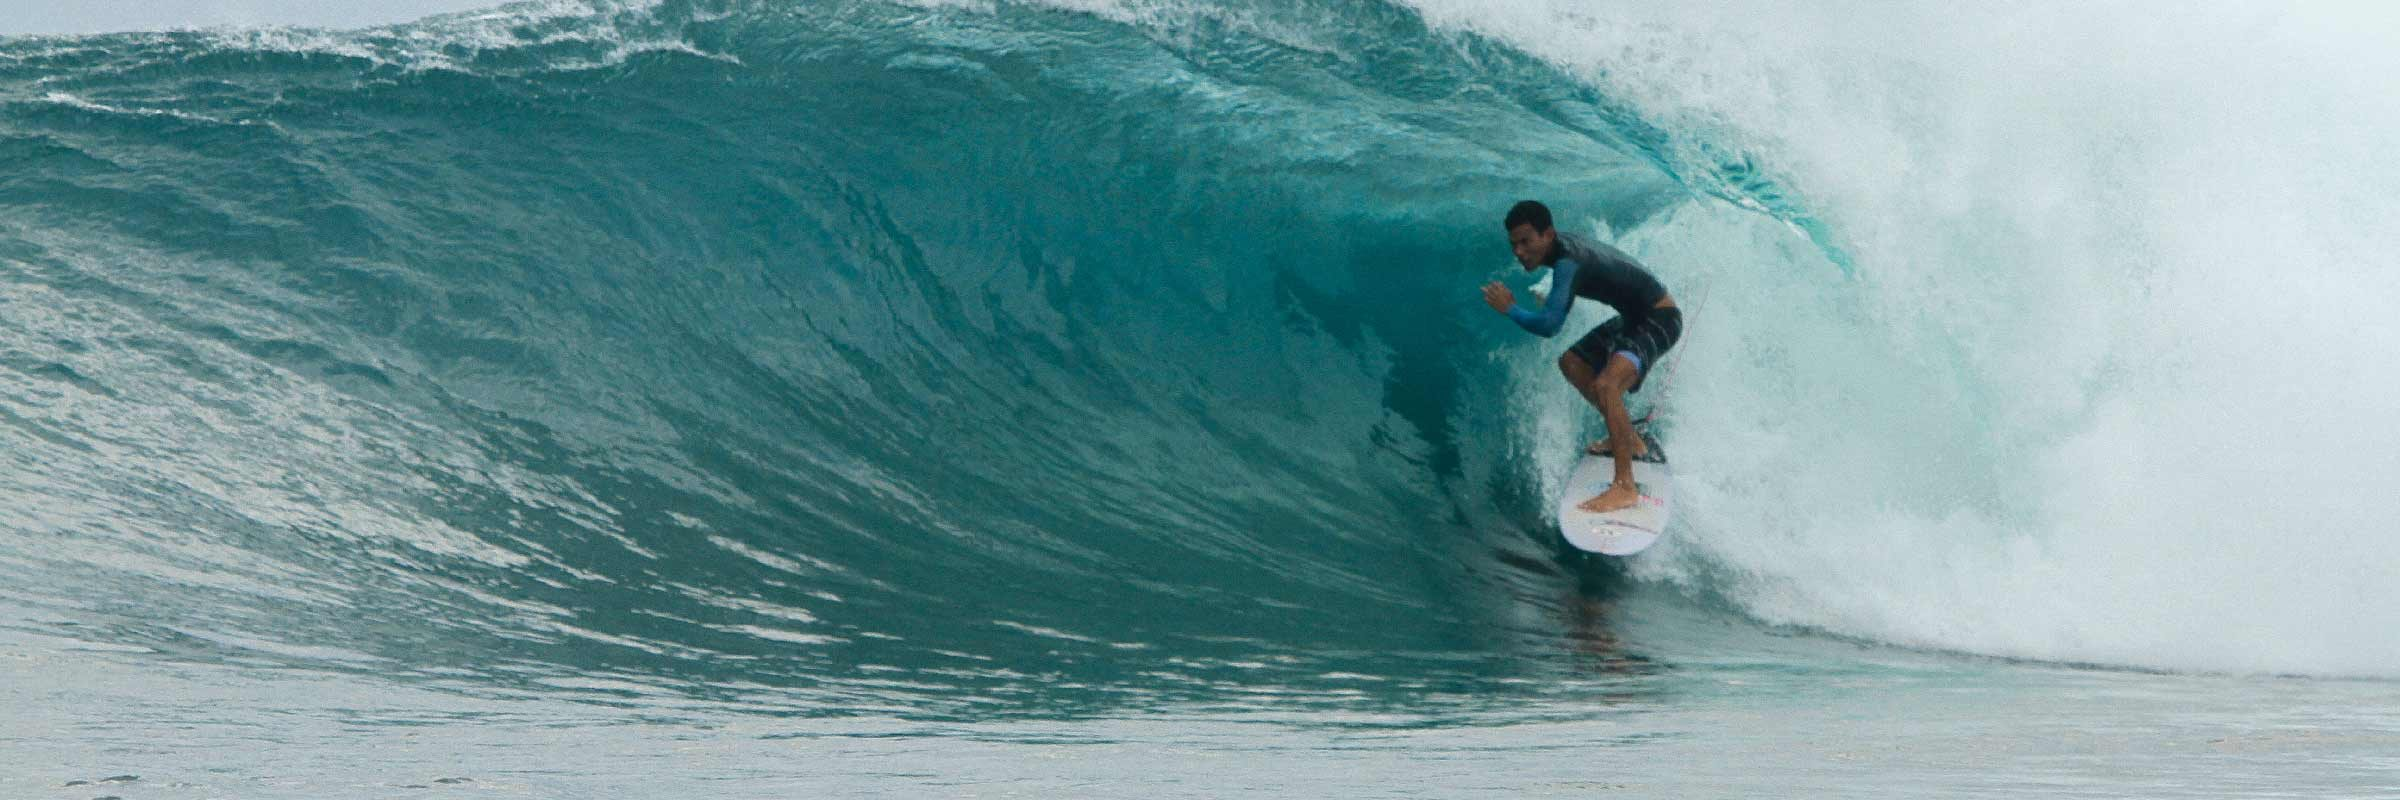 Shortboard Agus Lembongan Laceration